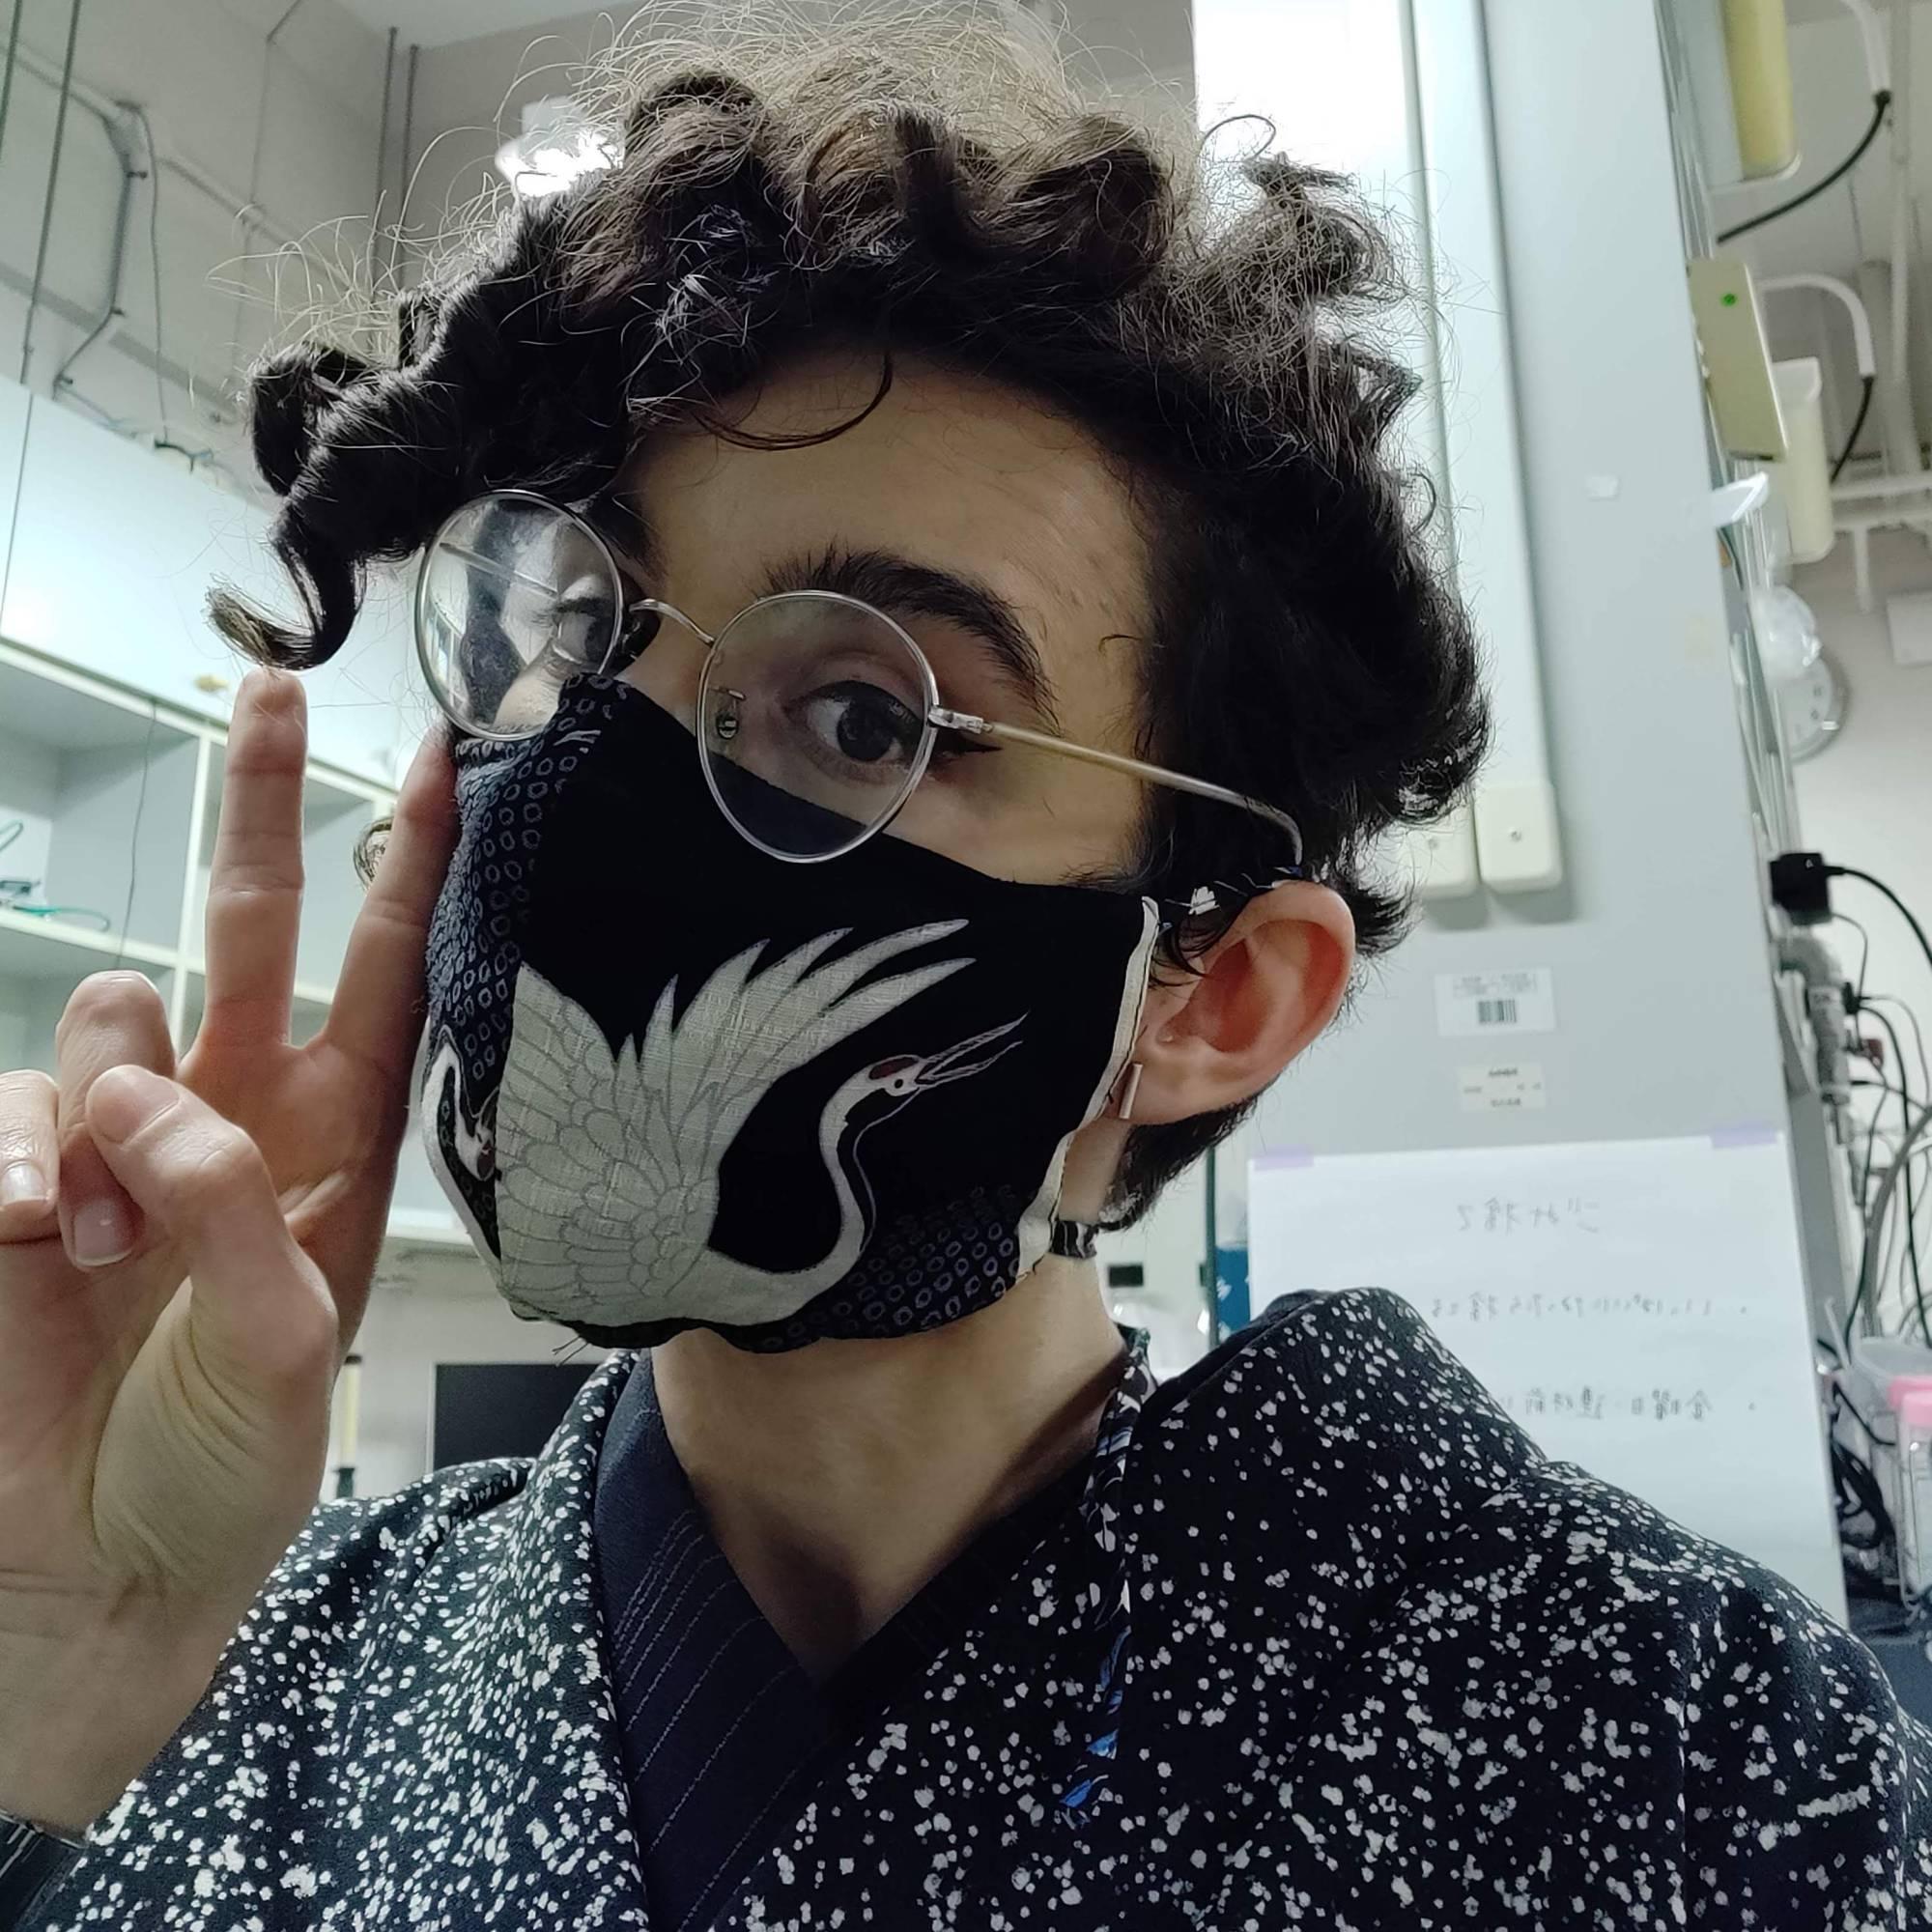 Emilia wearing a mask